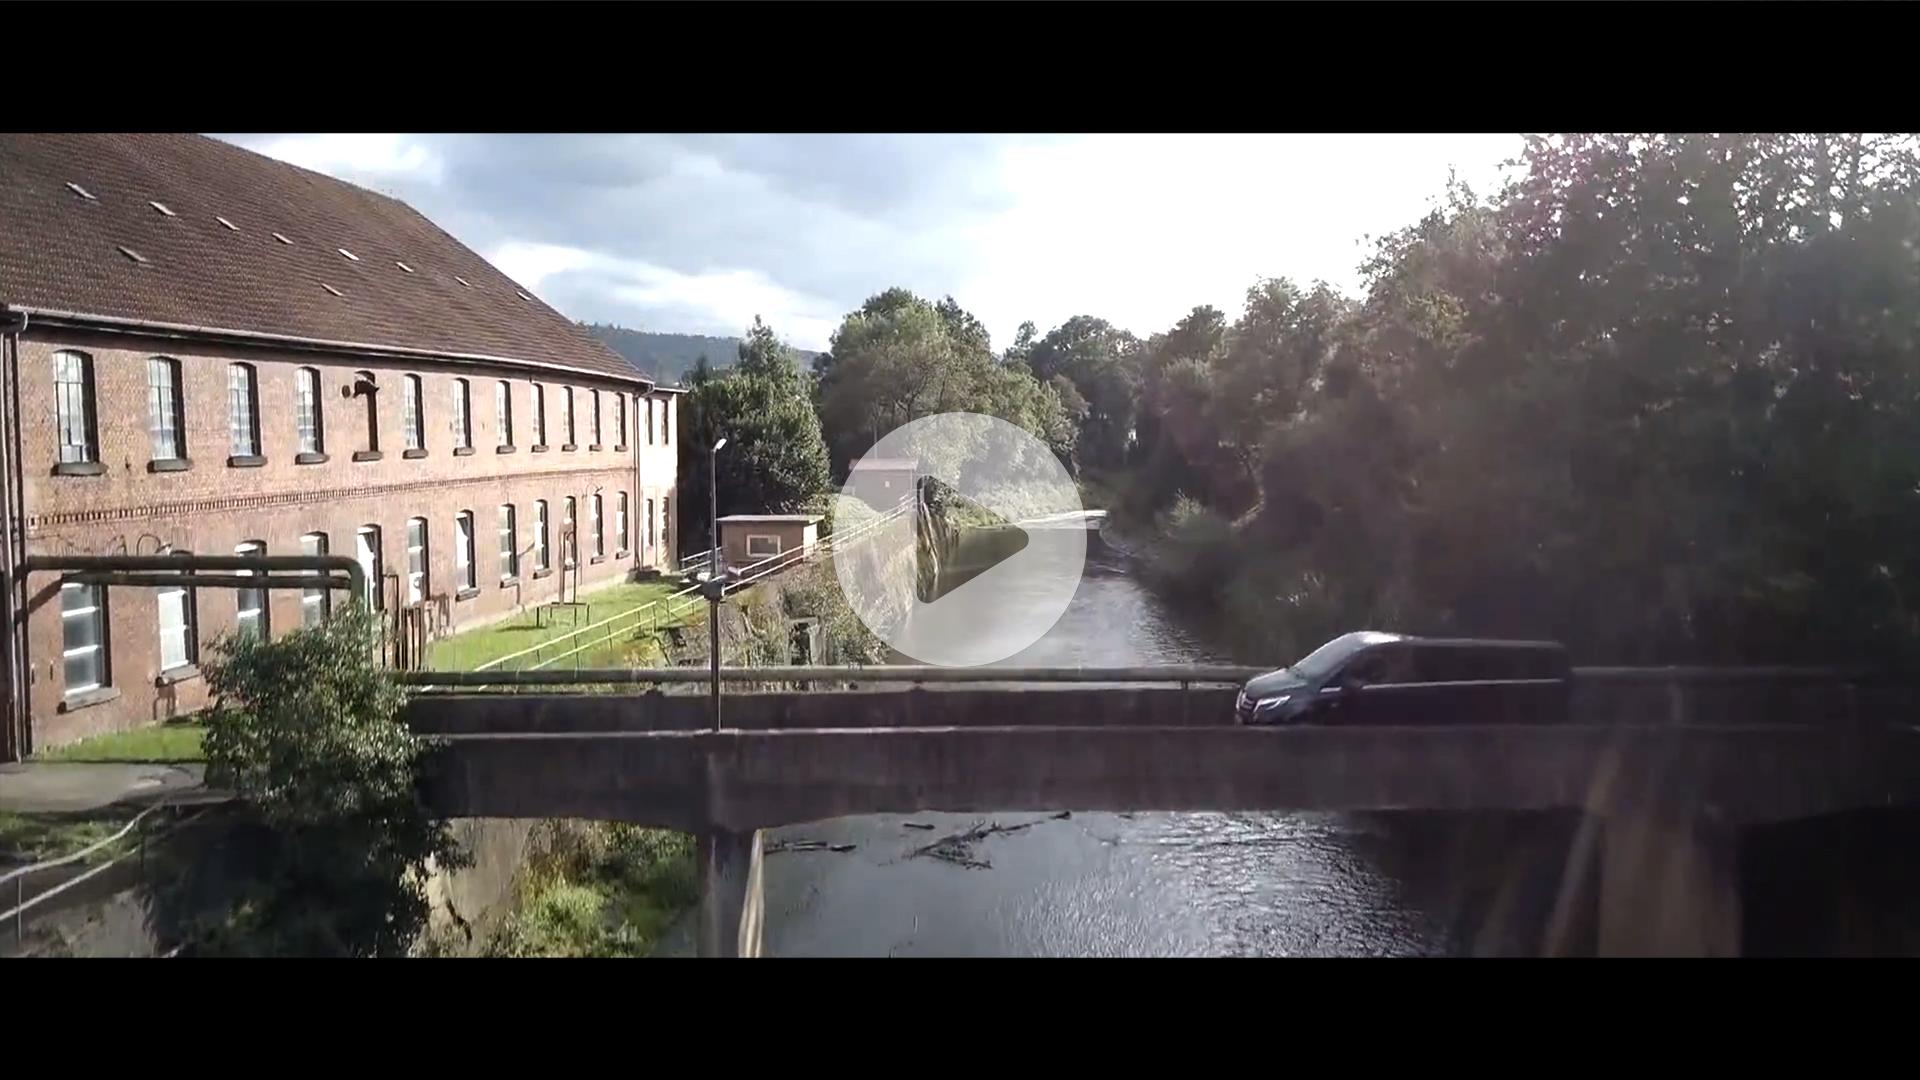 HellwigStudios Mercedes-Benz Fahrhilfen